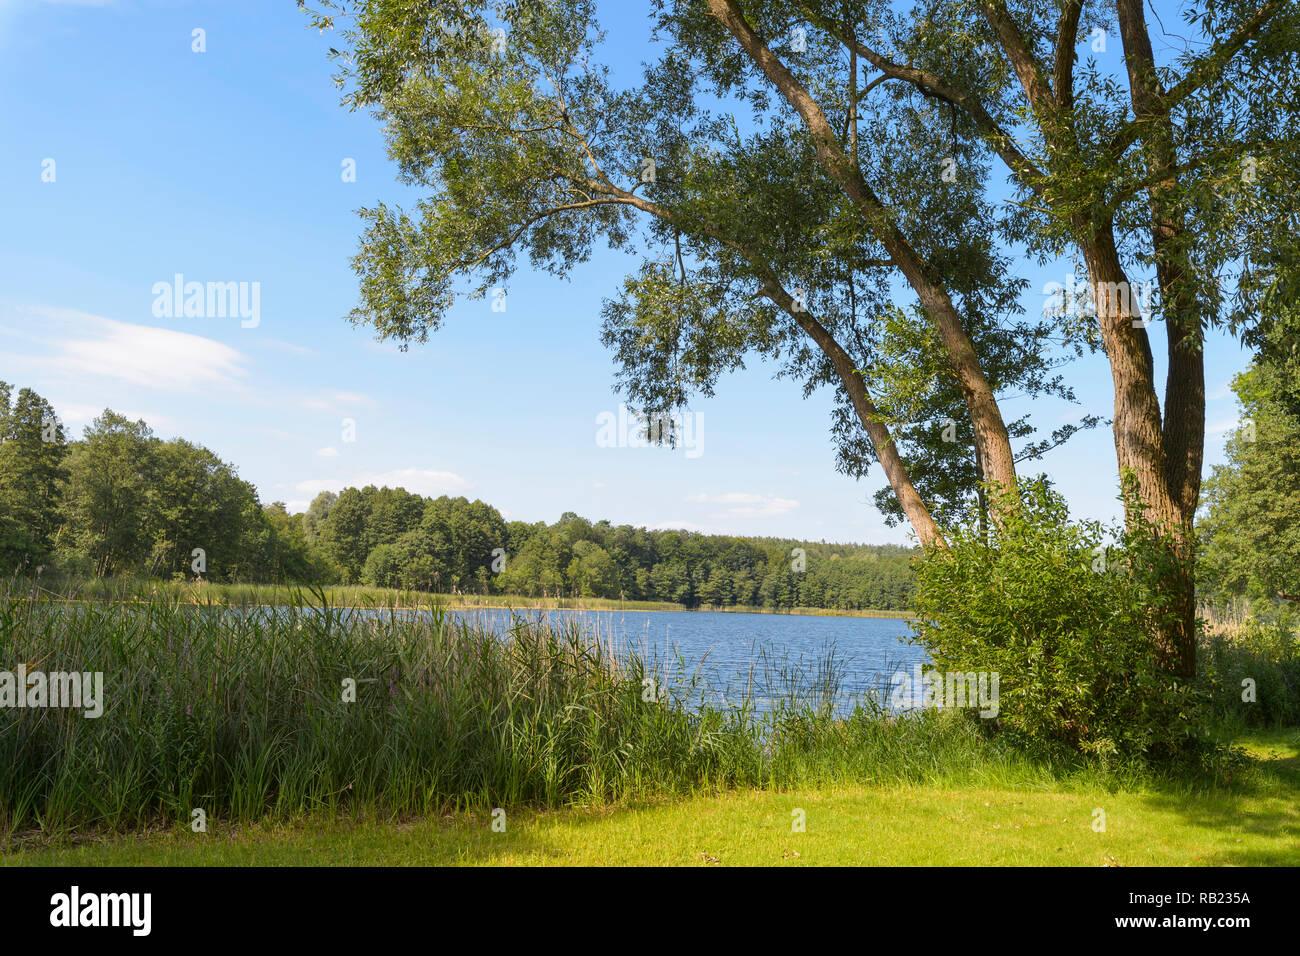 Lake Dagosee in summer, Neuglobsow, Rheinsberg, Ruppiner Land, Brandenburg, Germany - Stock Image